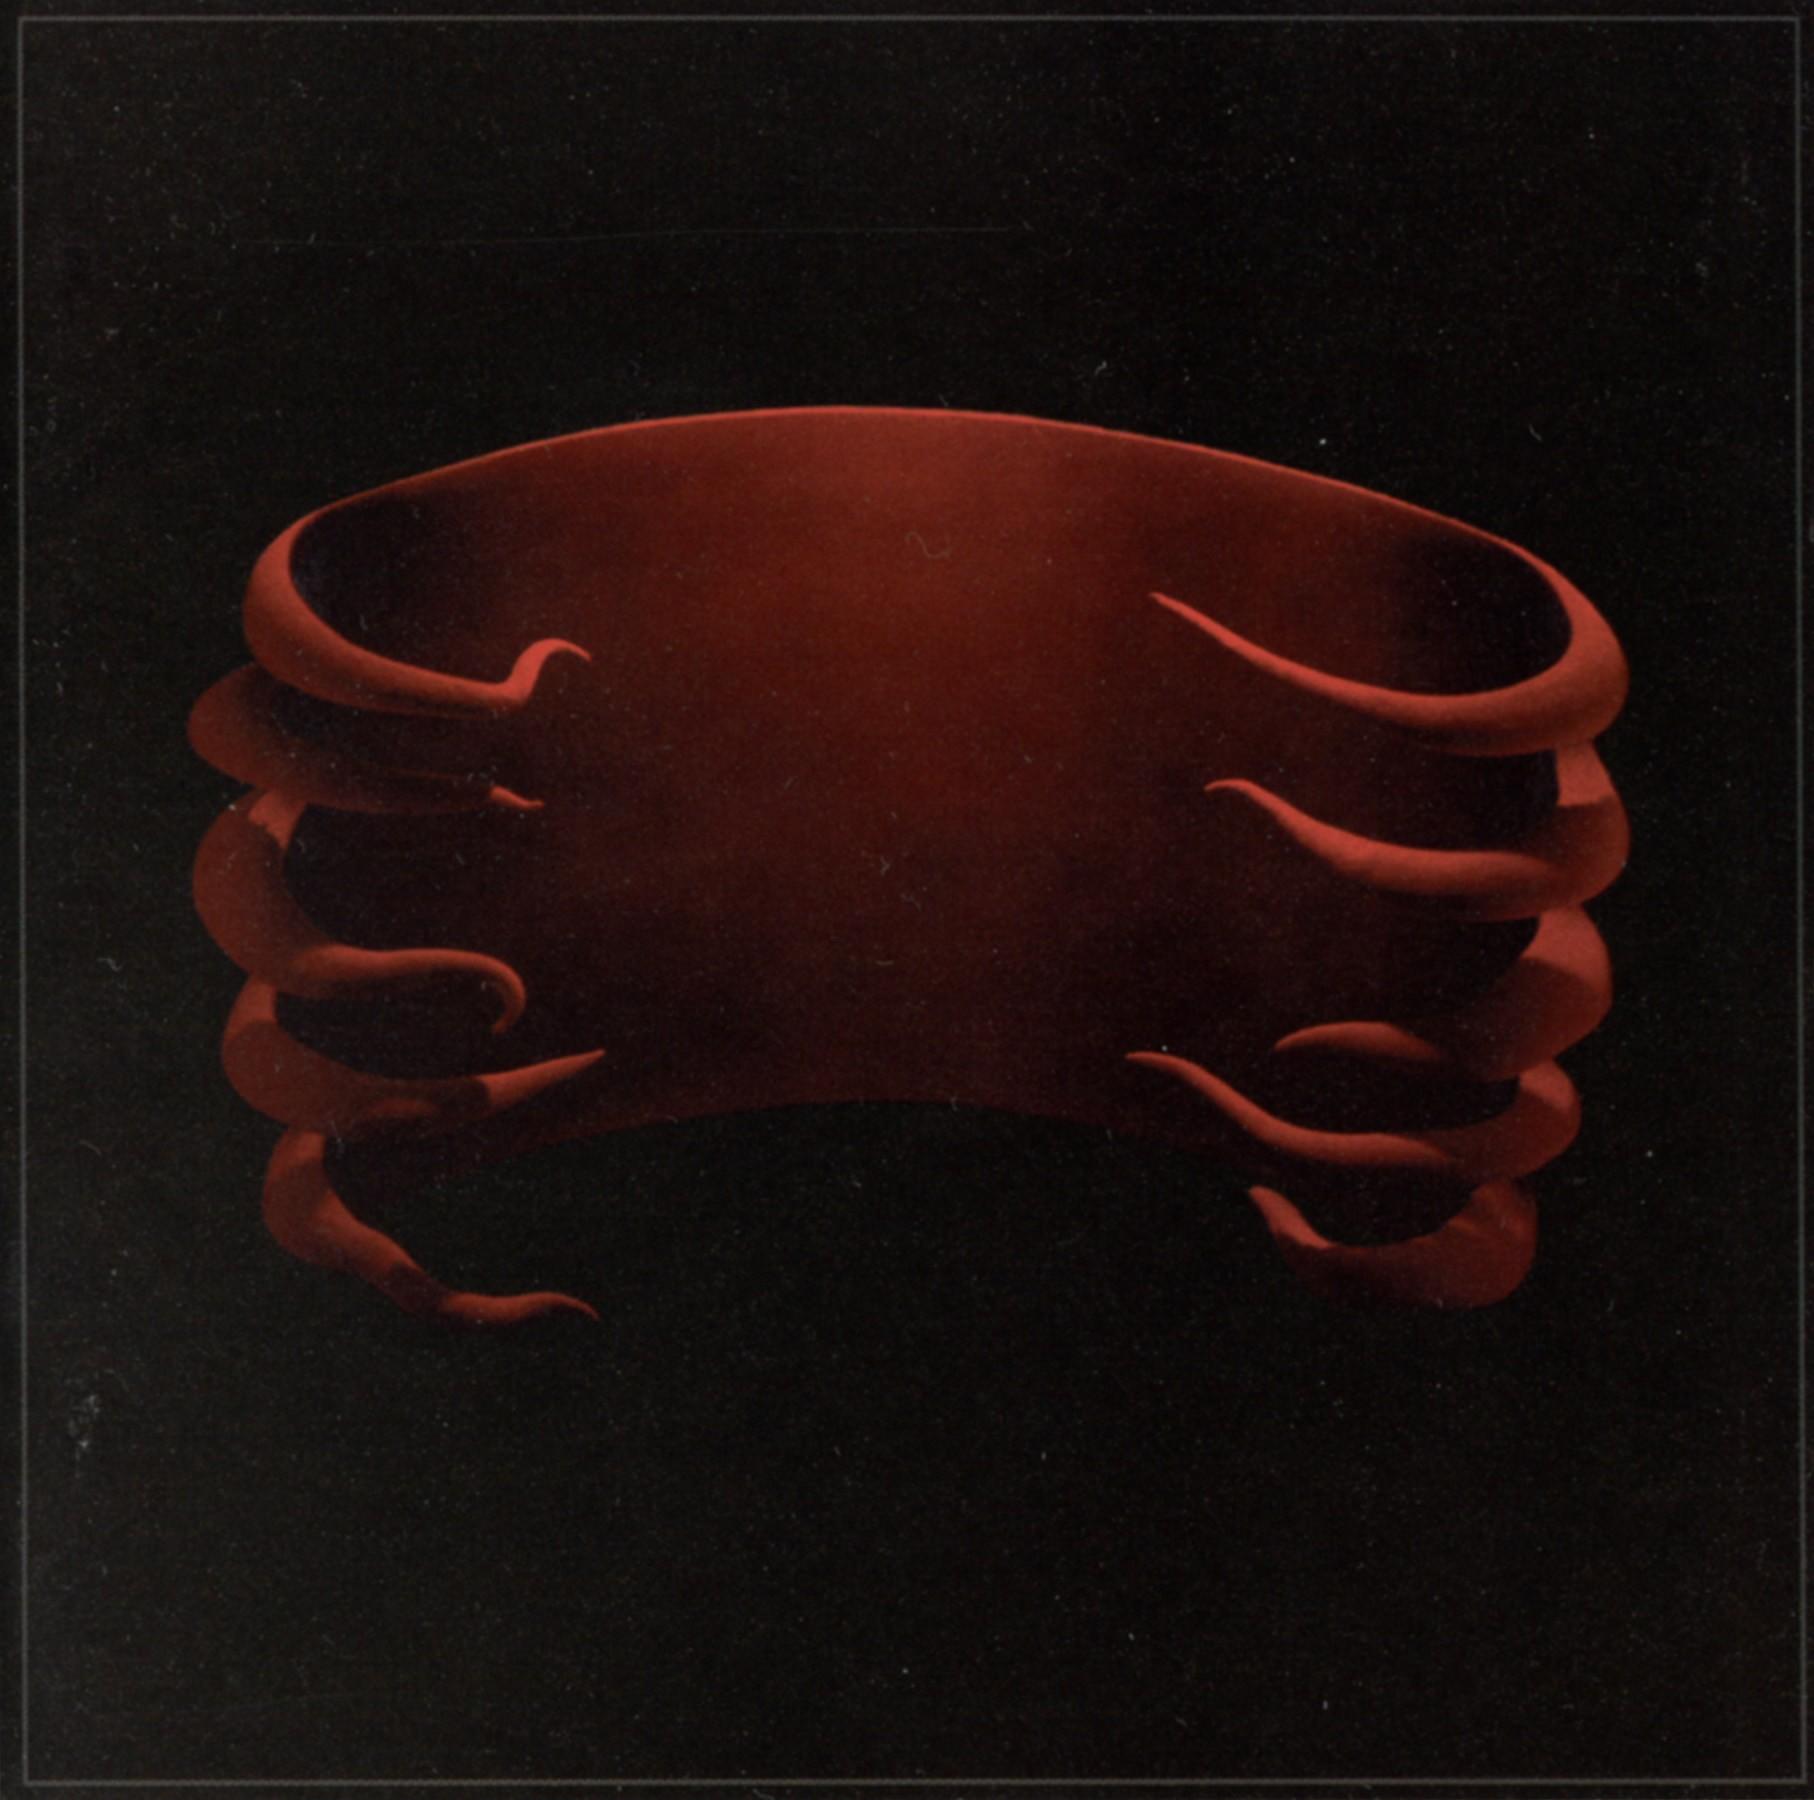 Tool - Undertow LP